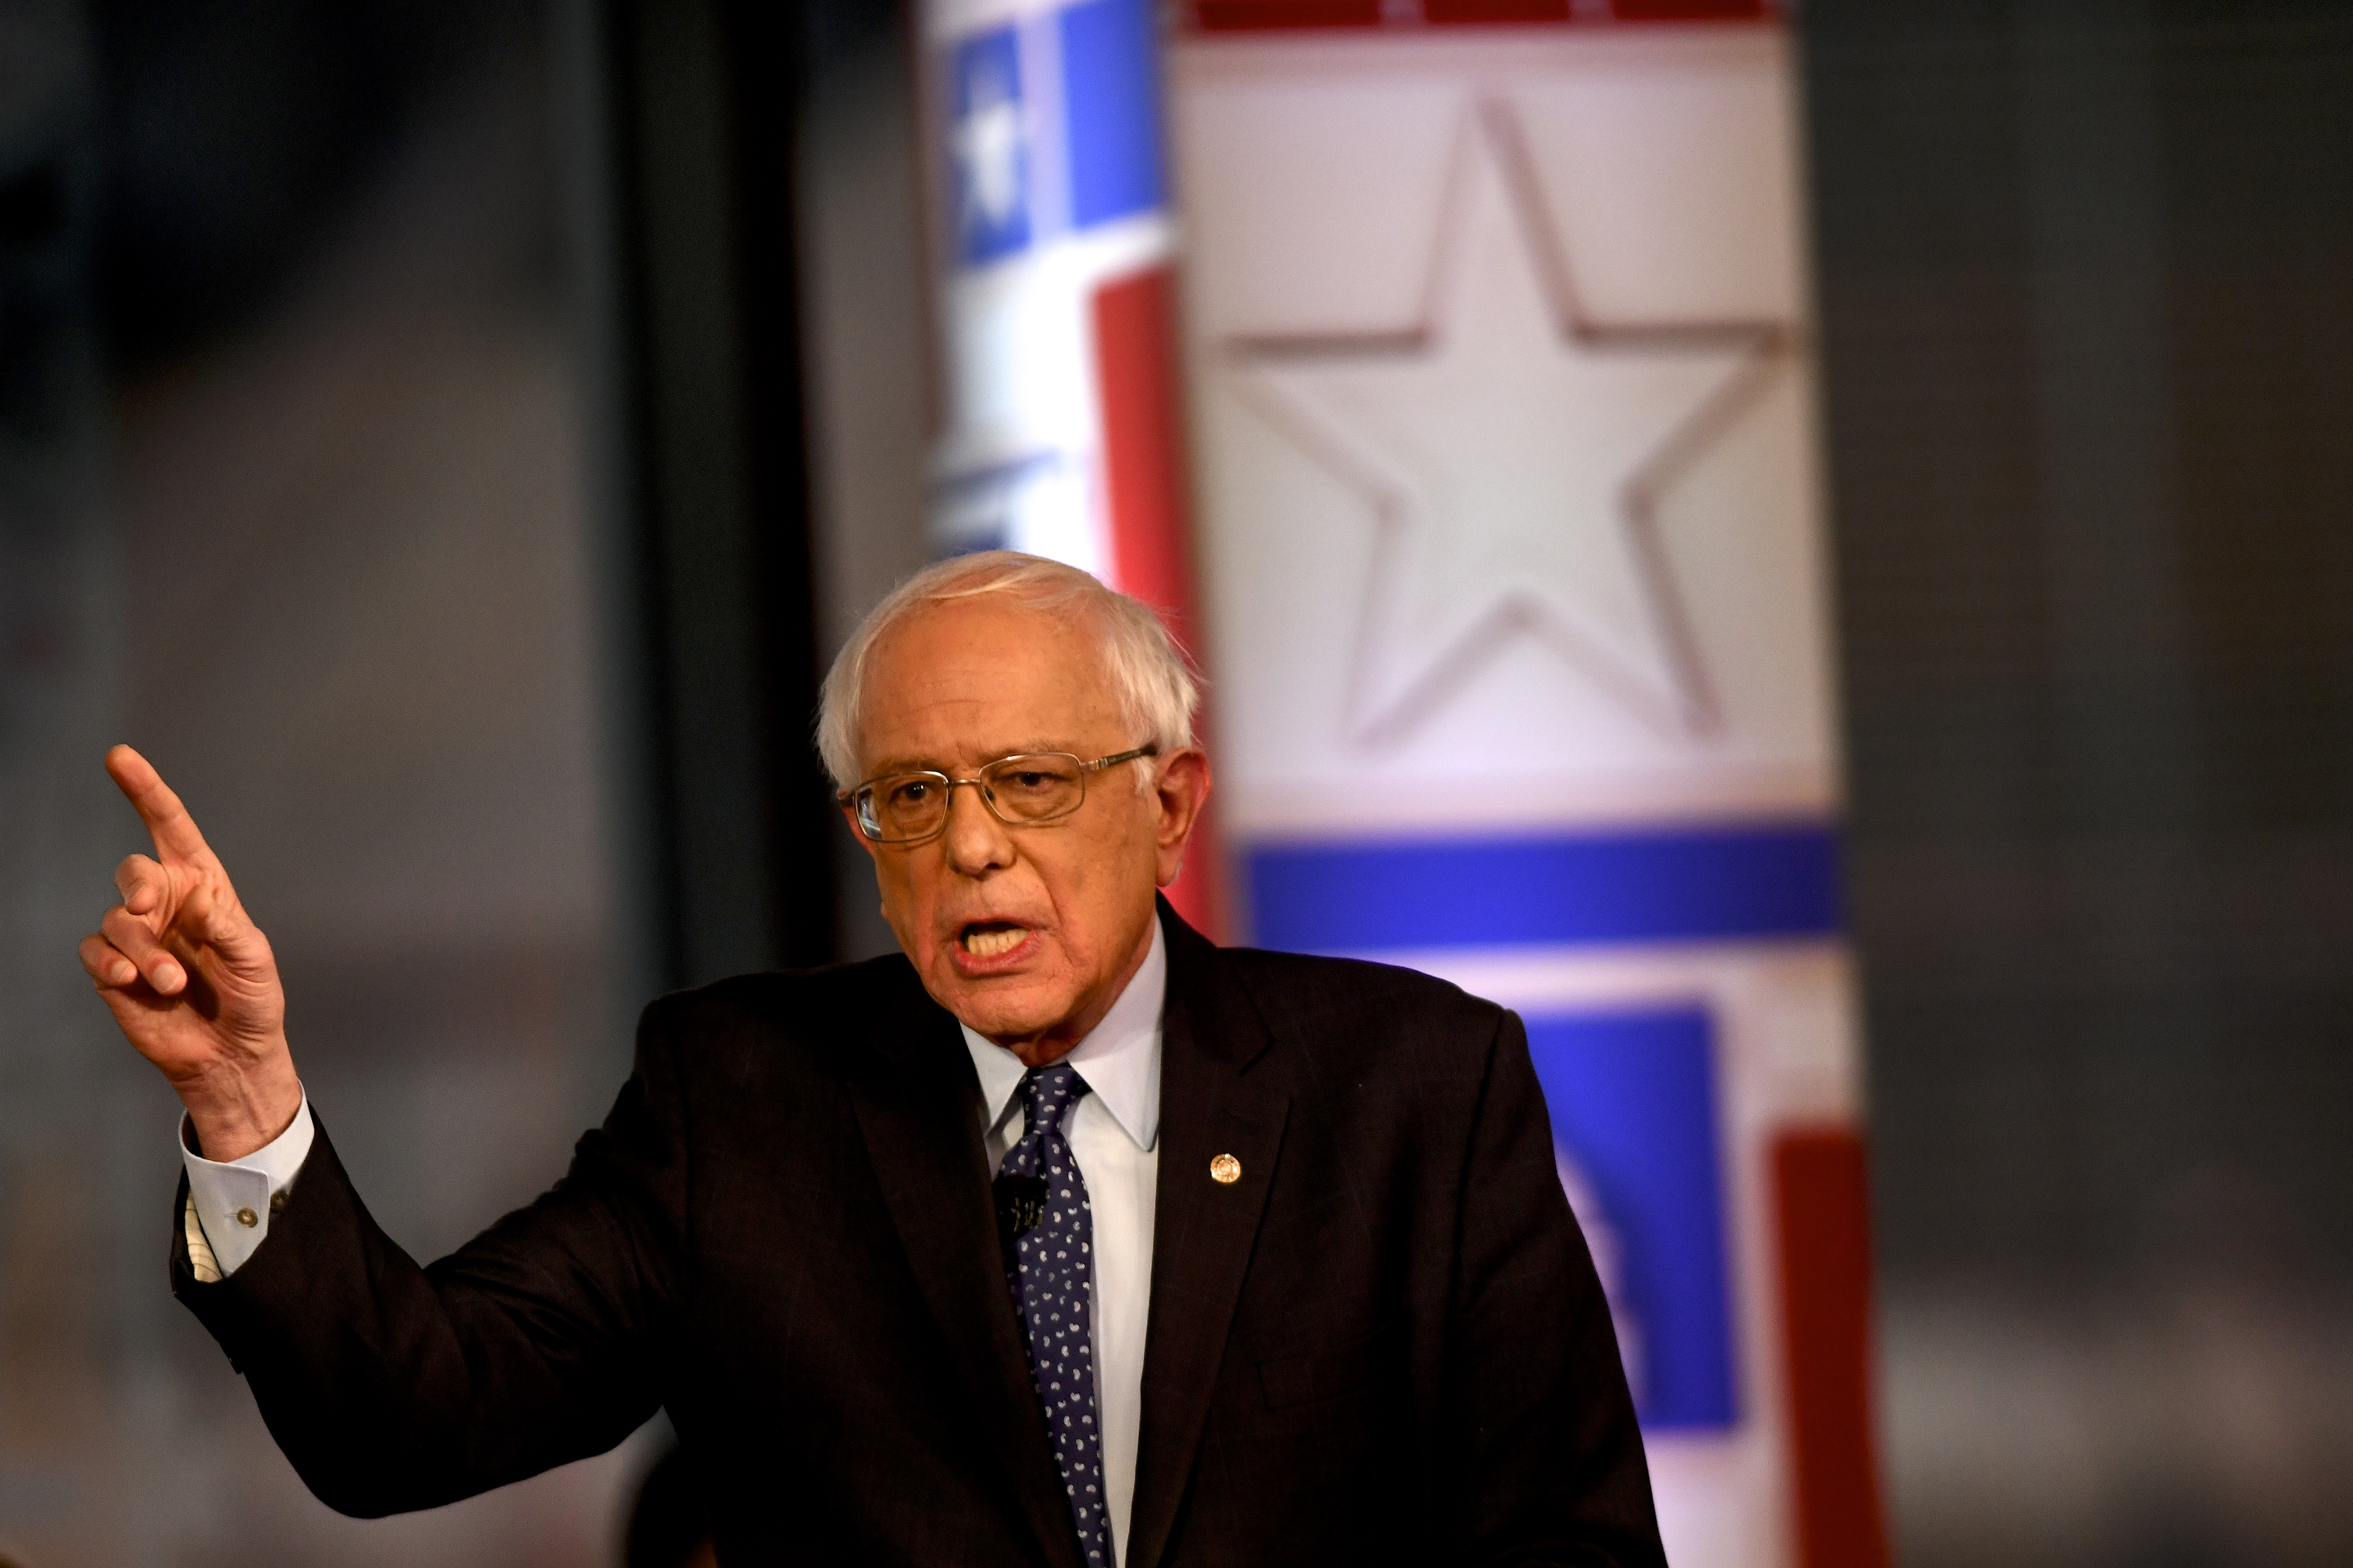 2020: The logic of Bernie Sanders's continuing war against Clintonworld